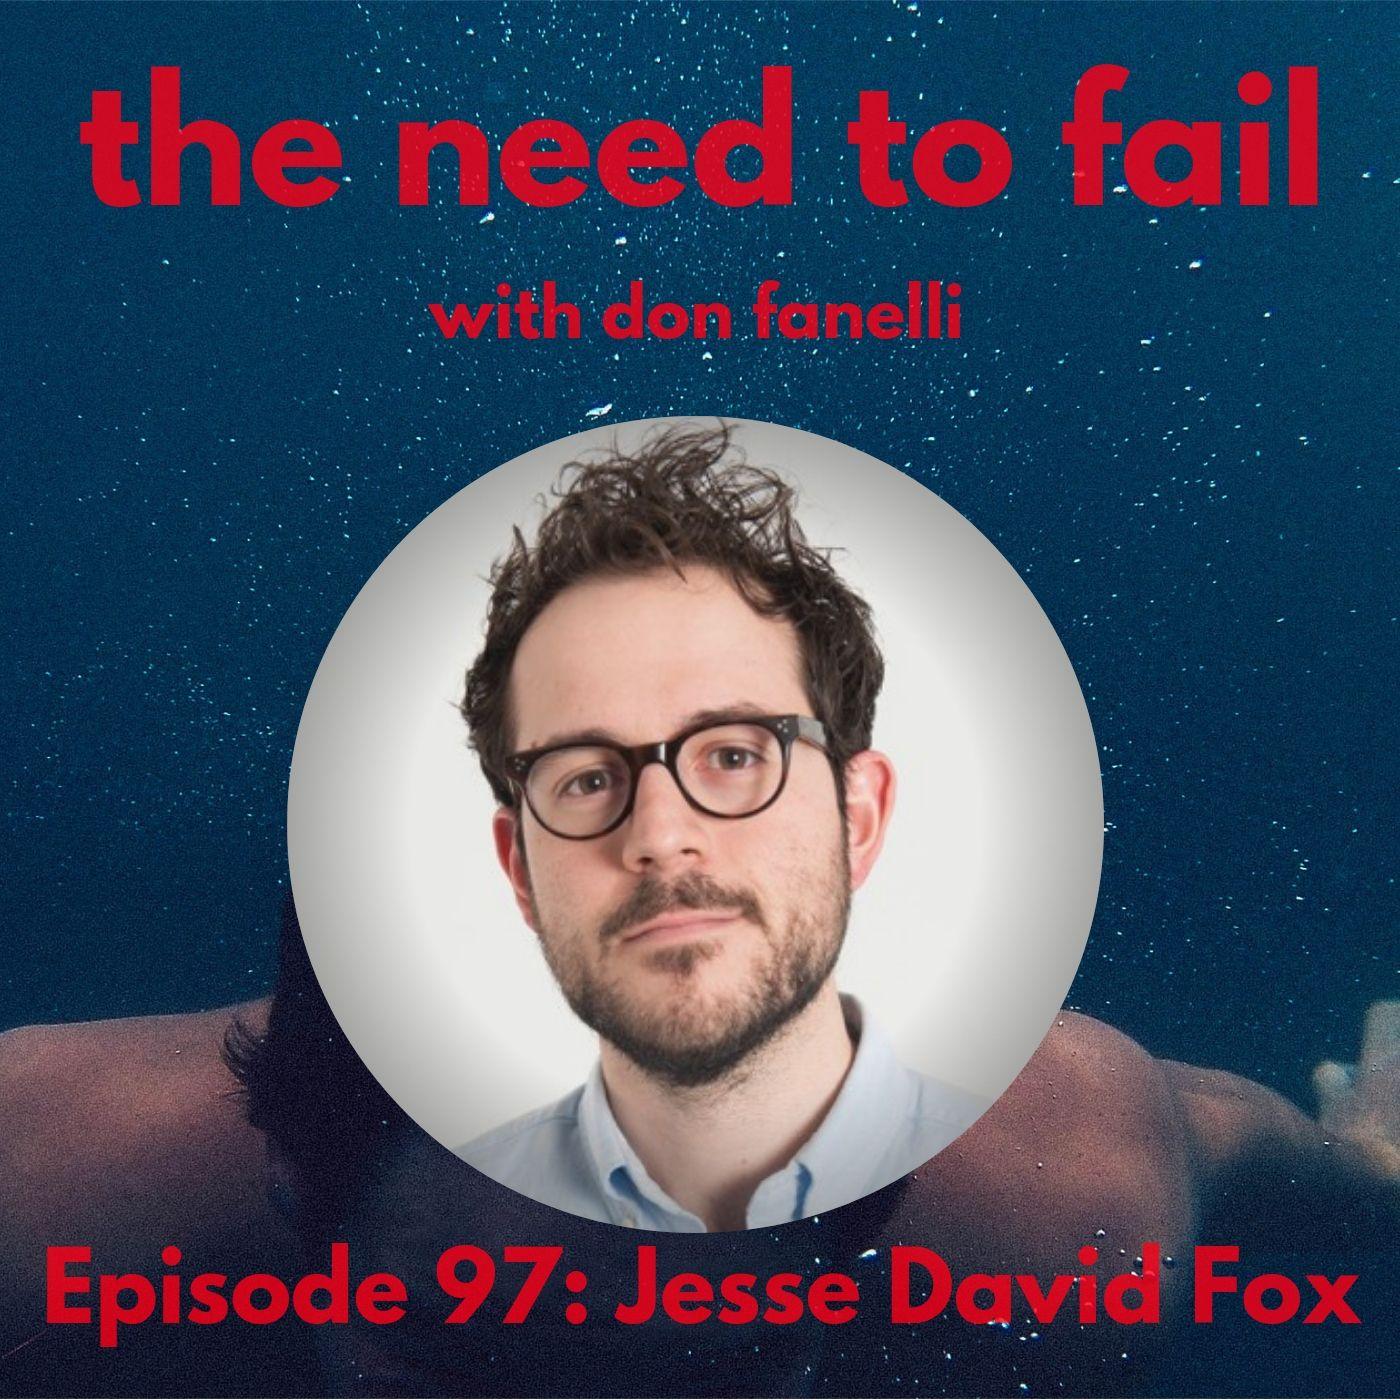 Episode 97: Jesse David Fox